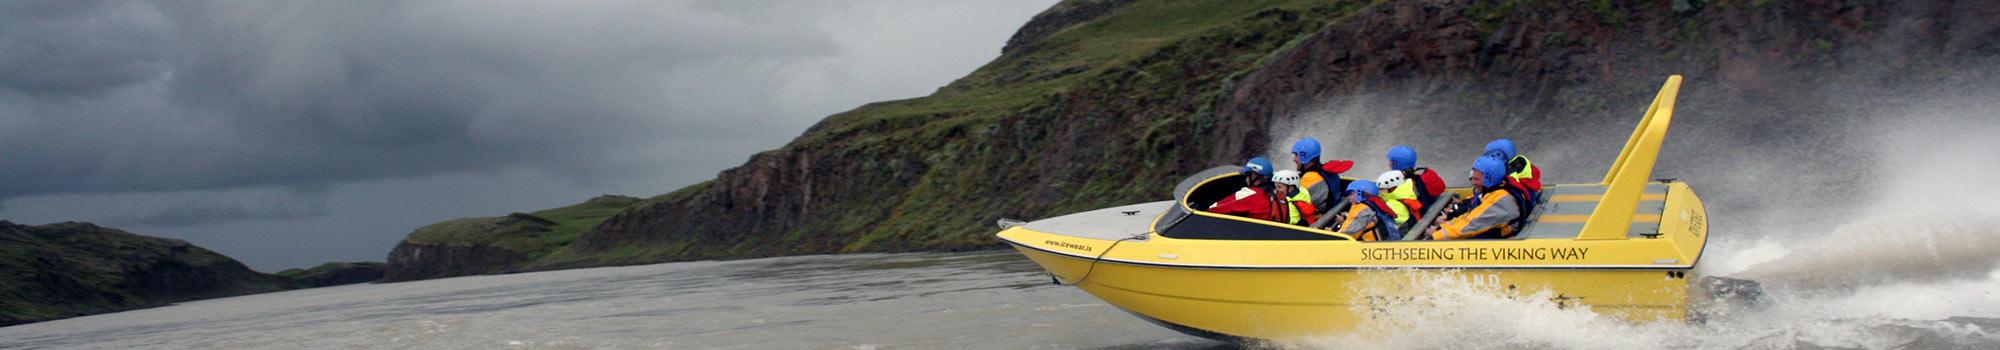 jet-boat-adventure